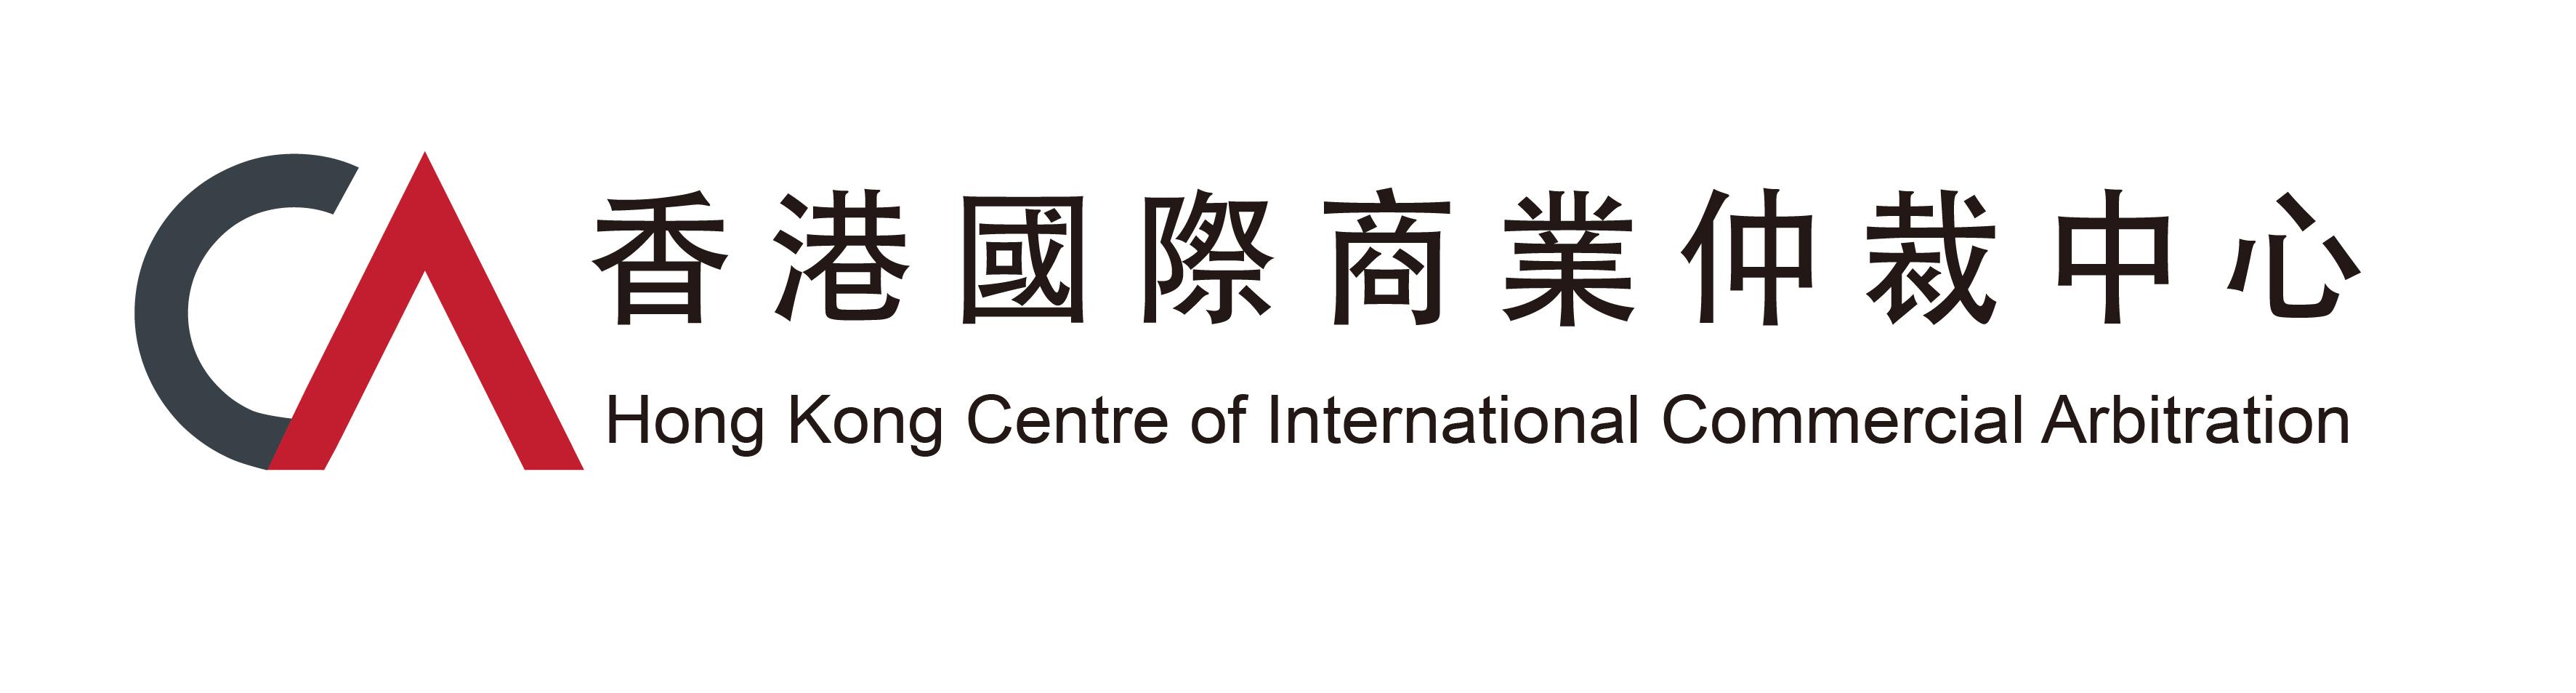 HKCICA_logo (CA logo_OL_Black).